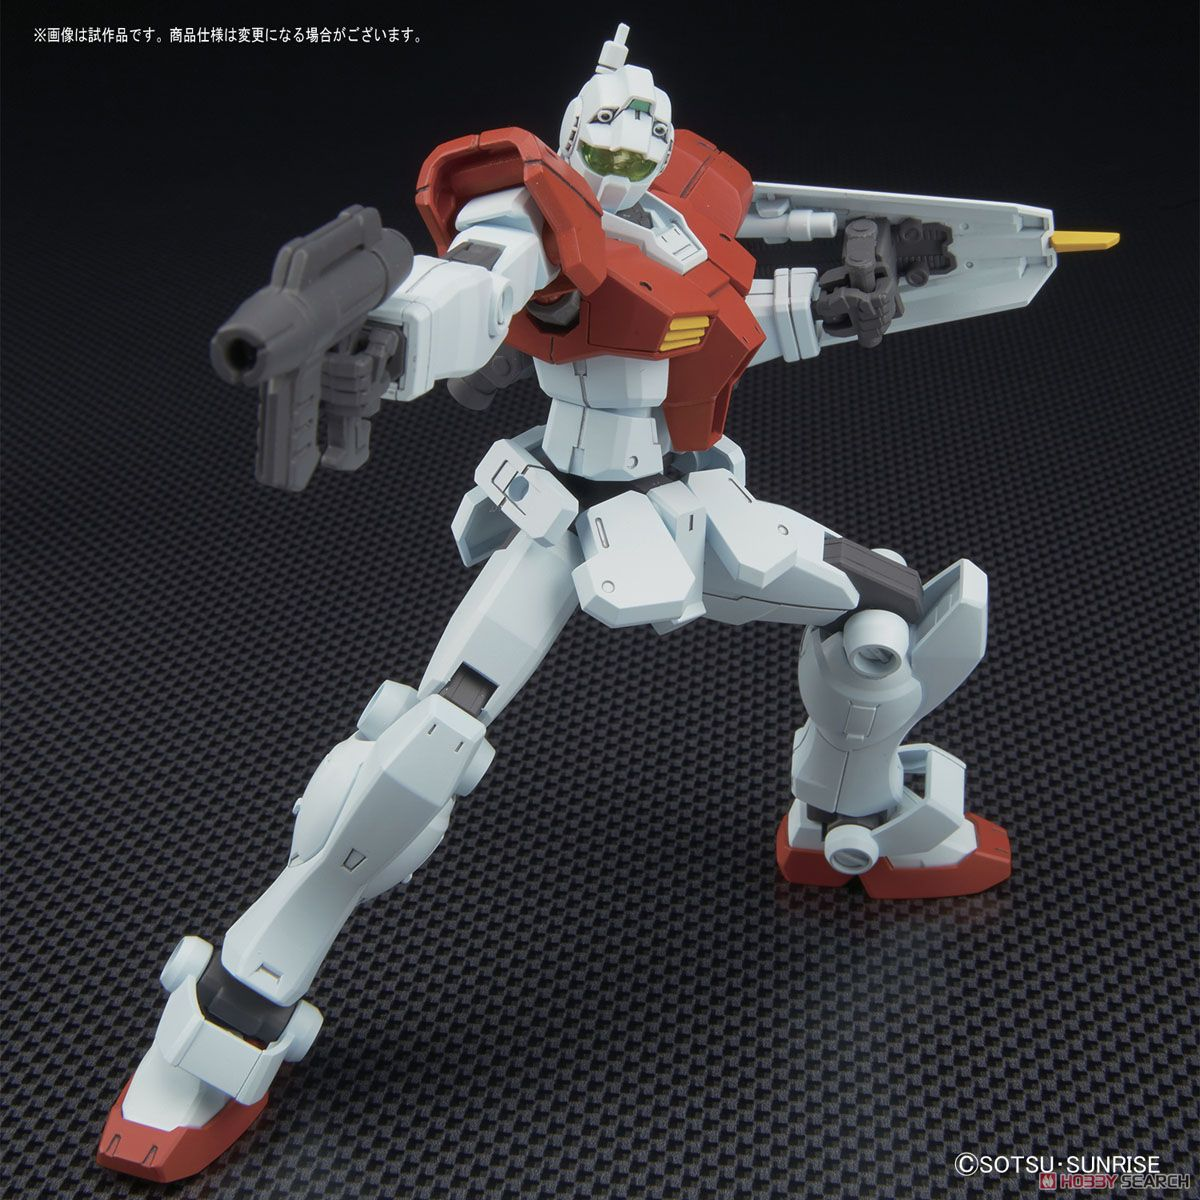 GM/GM (HGBF) (Gundam Model Kits) Item picture6